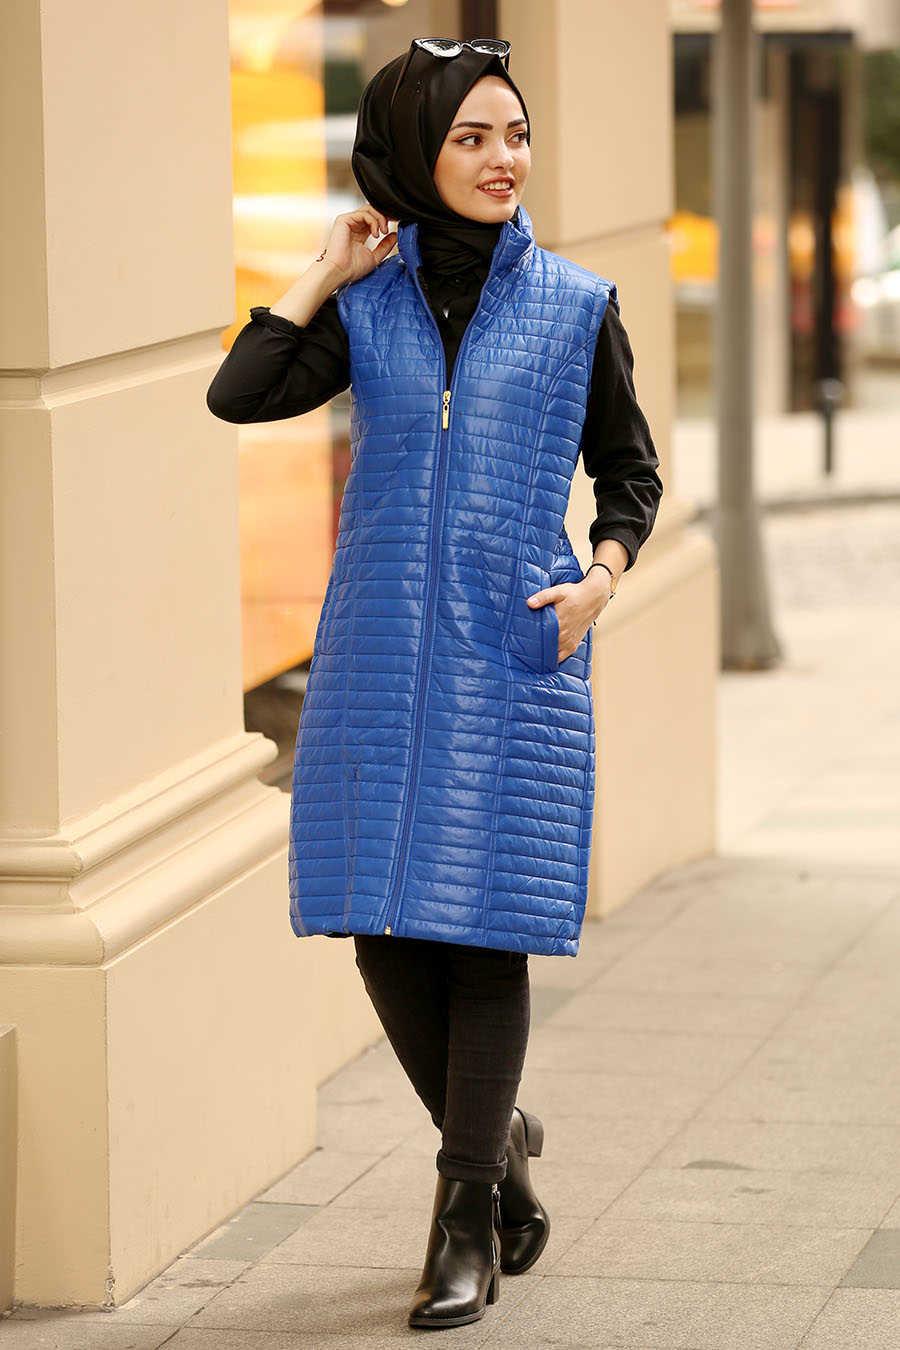 Neva Style - Sax Blue Hijab Coat 5001SX